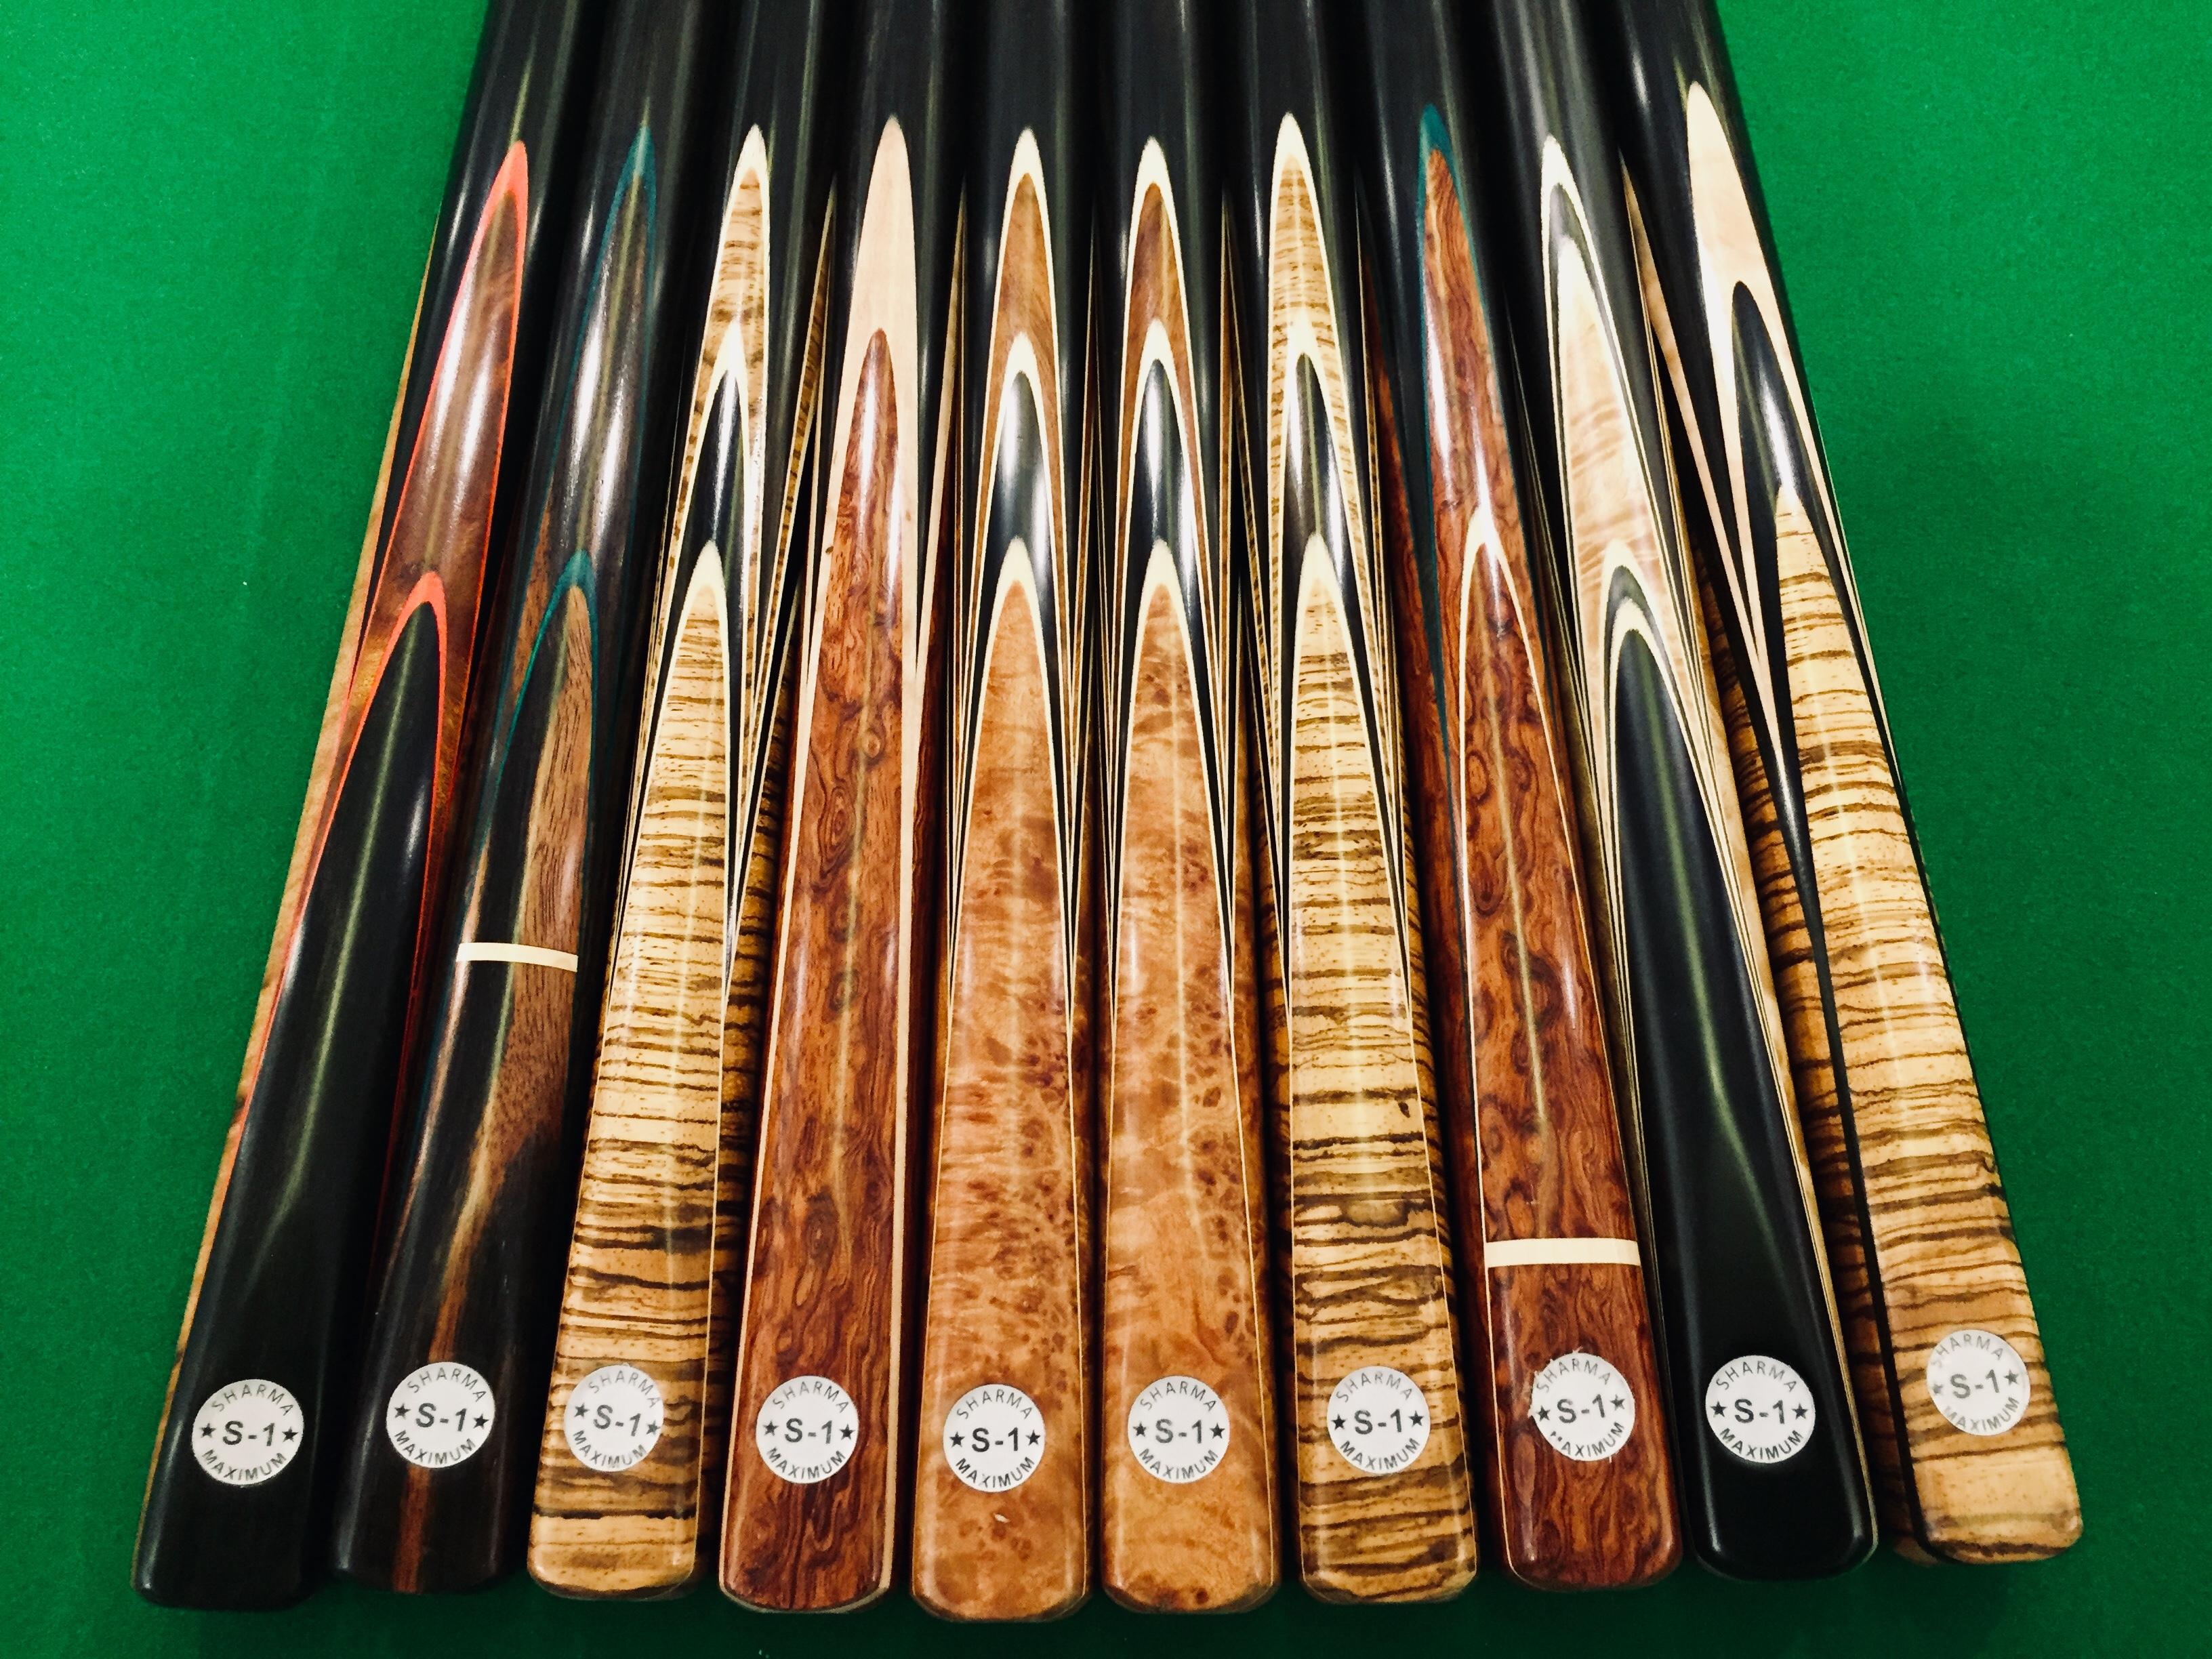 S-1 Professional Billiards Cues